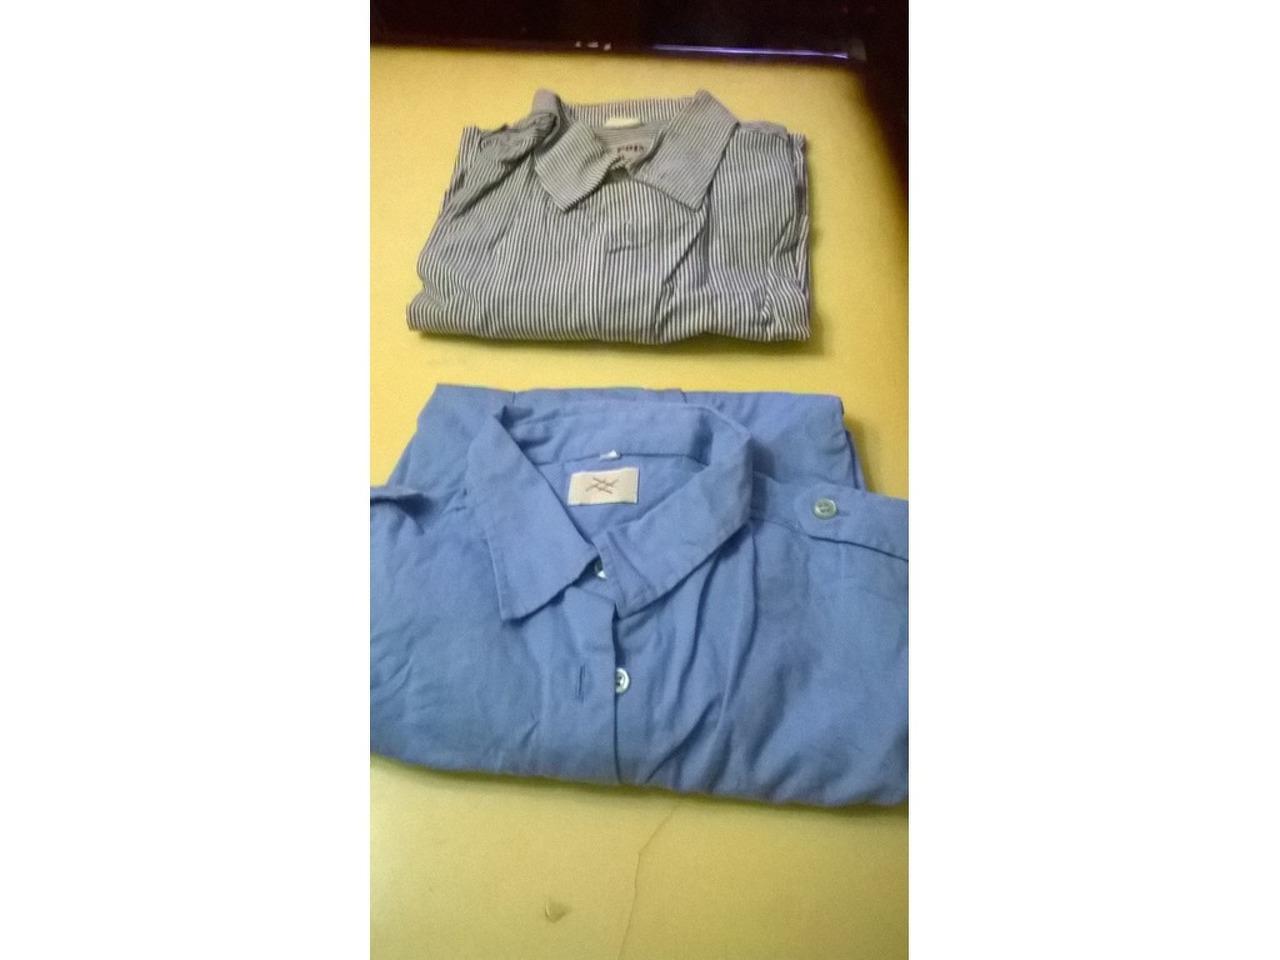 Camisas Diversas (2ª mão) WestPoint, Emidio Tucci, Posse, etc - 1/4